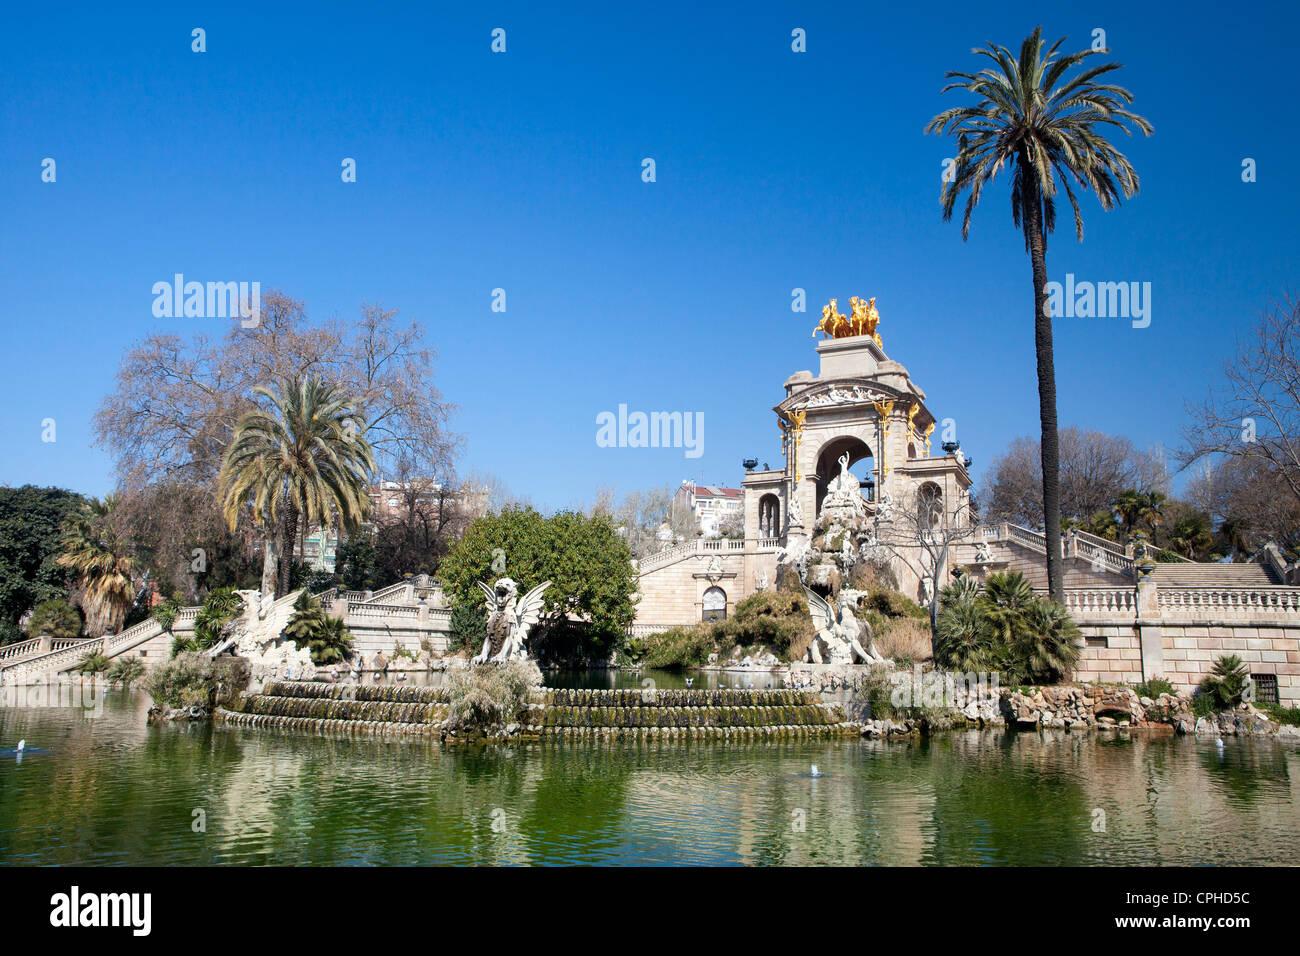 barcelona spain europe gaudi architecture ciutadella famous